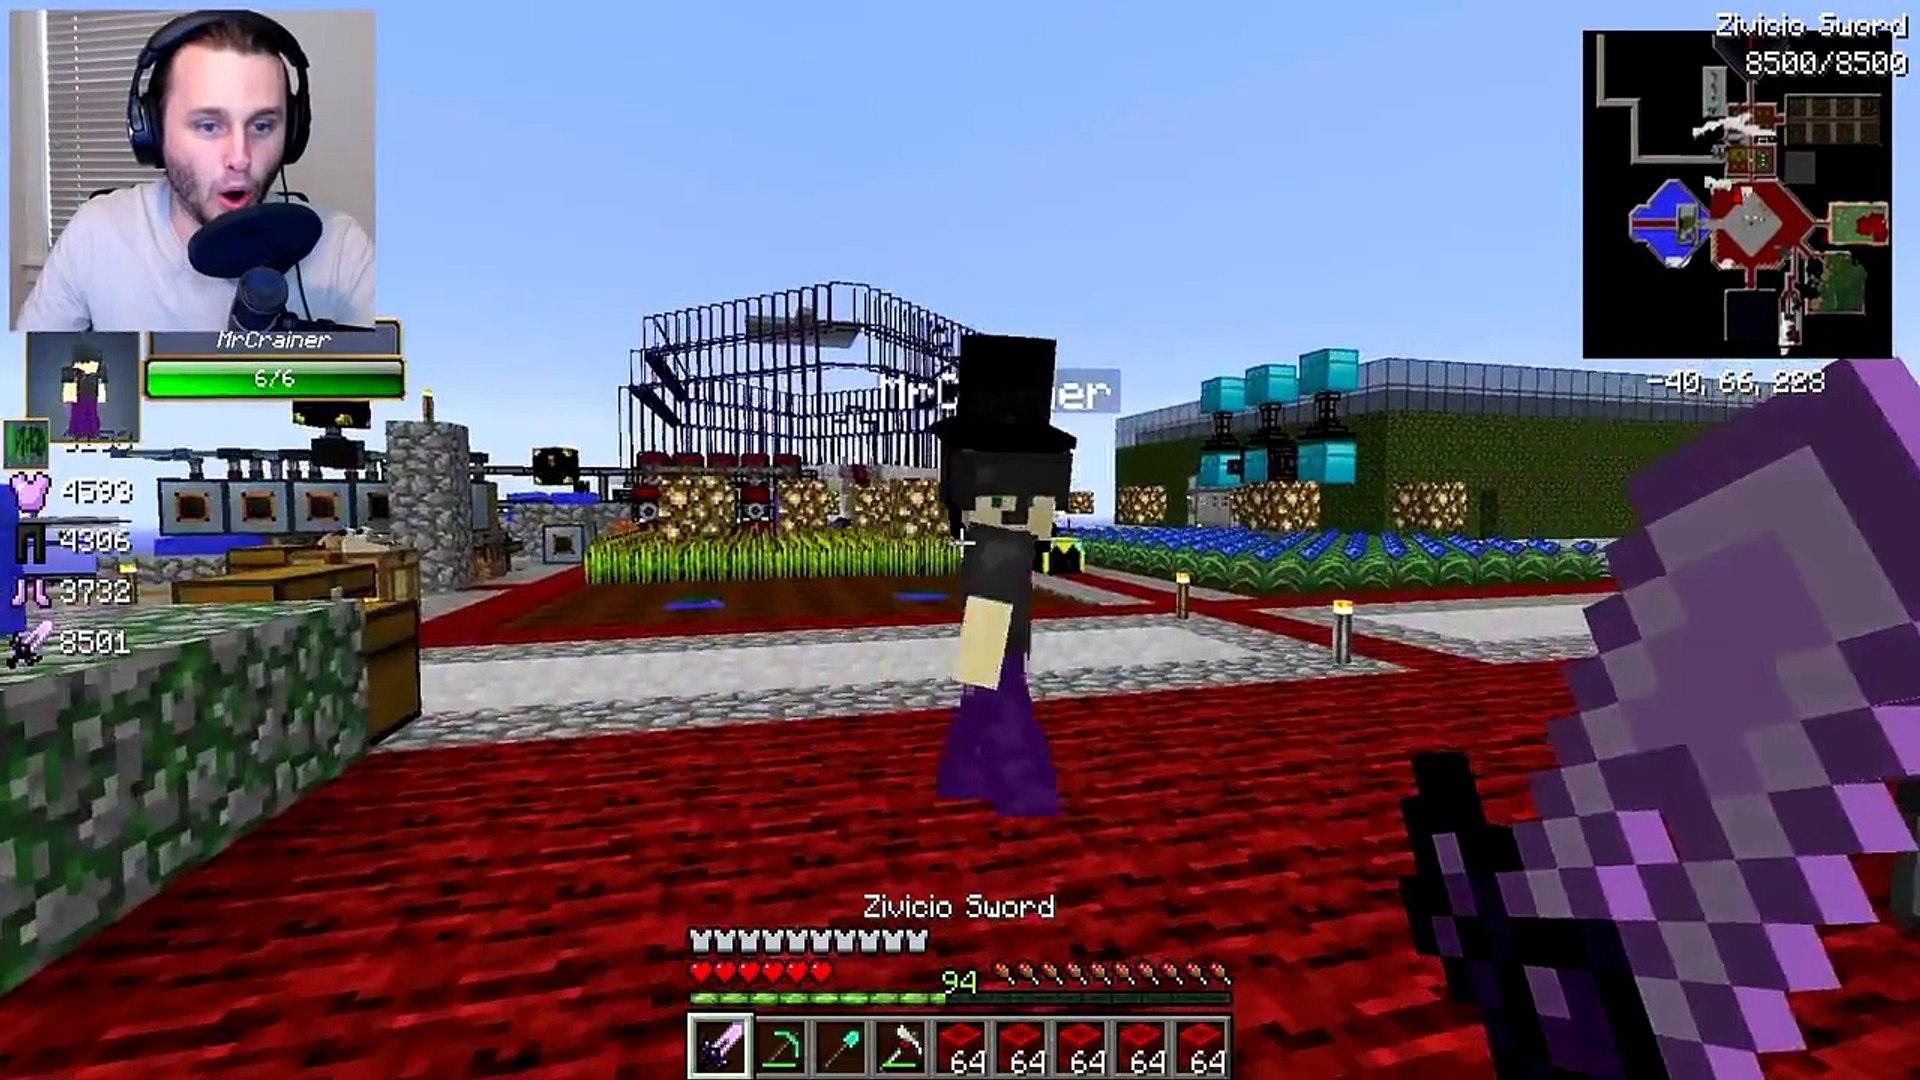 ssundee, Minecraft SkyFactory 2 - DRACONIC ENERGY CORE?! [20]